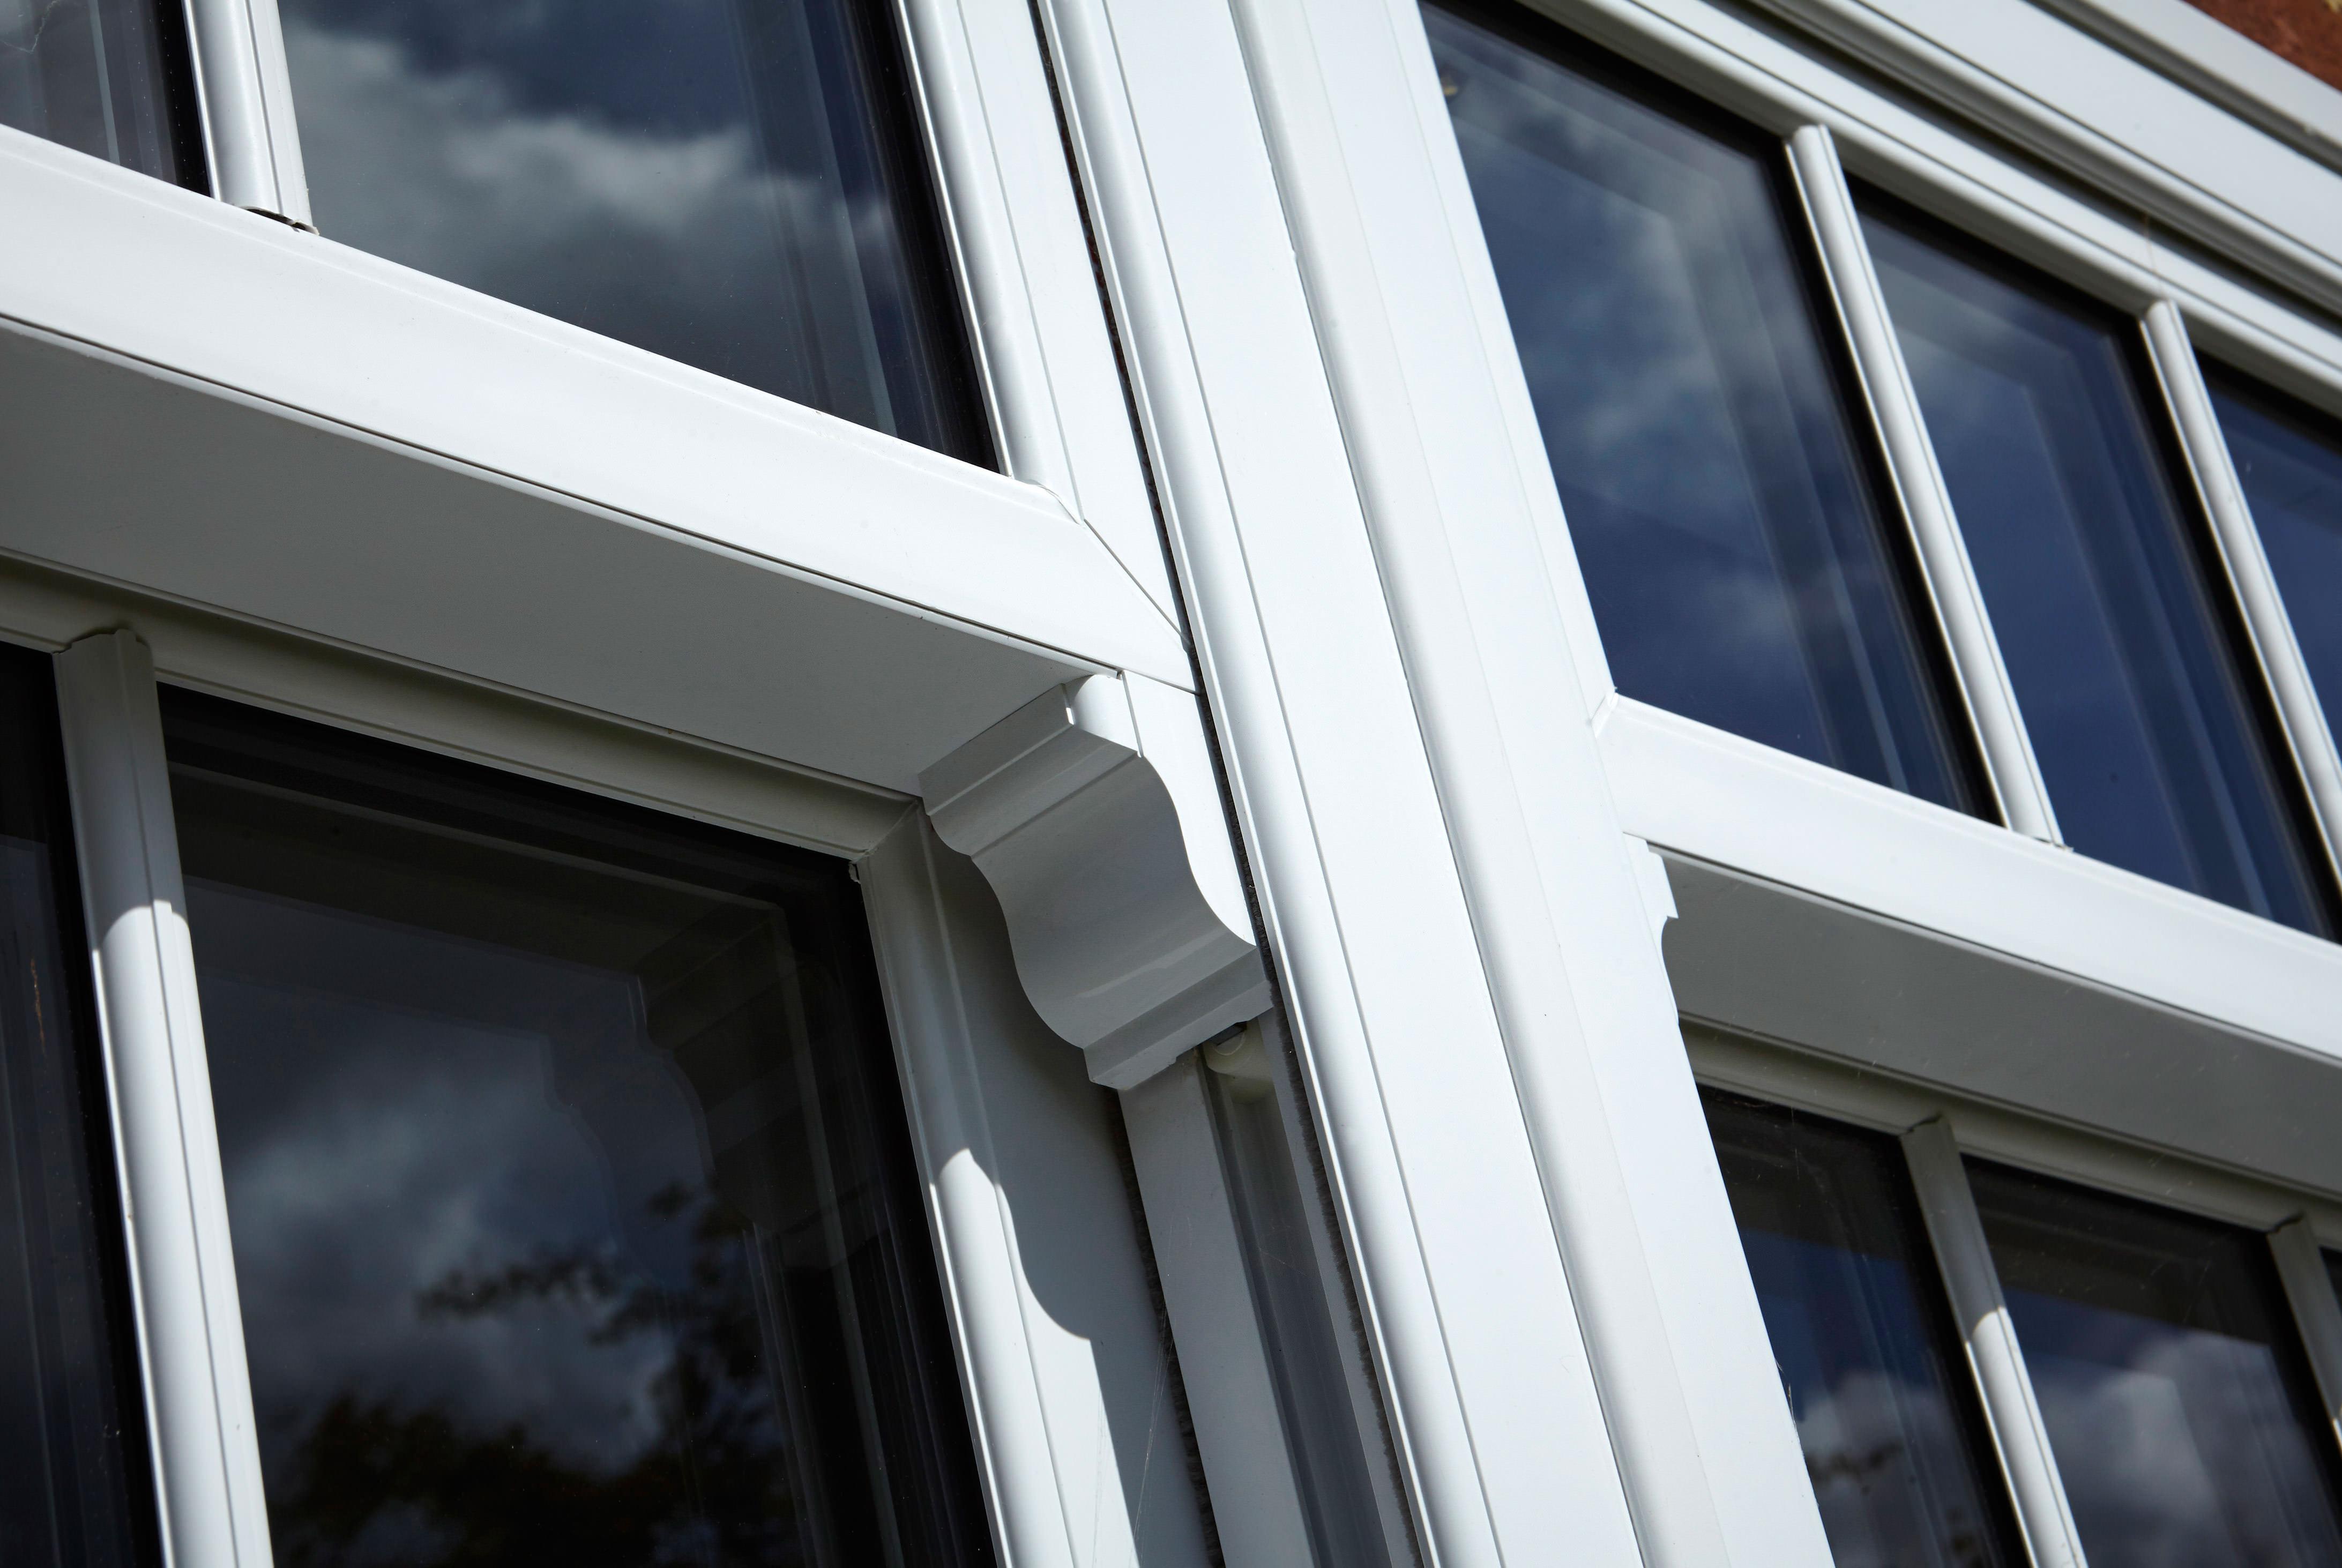 Double Glazed Windows Styles in Leominster